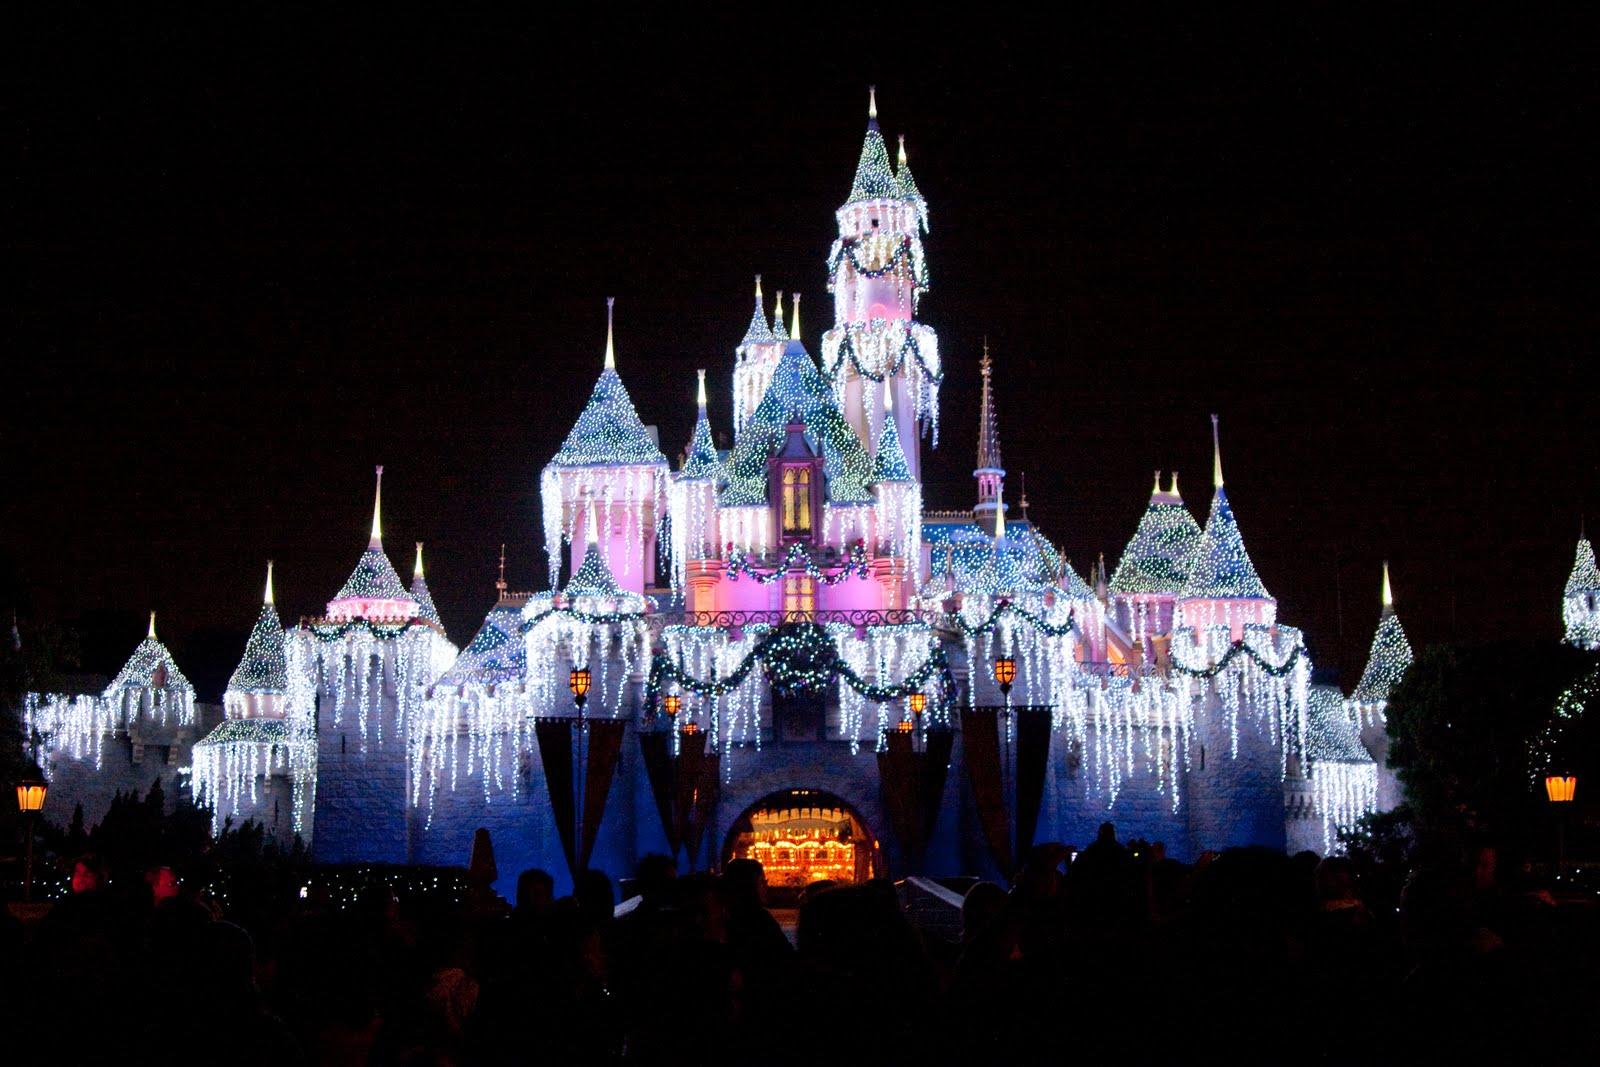 Disneyland Florida Disneyland, CA Versus Walt Disney World in Florida ... gift card: startbonus bwin, belgium bwin col:bel-bwin-001